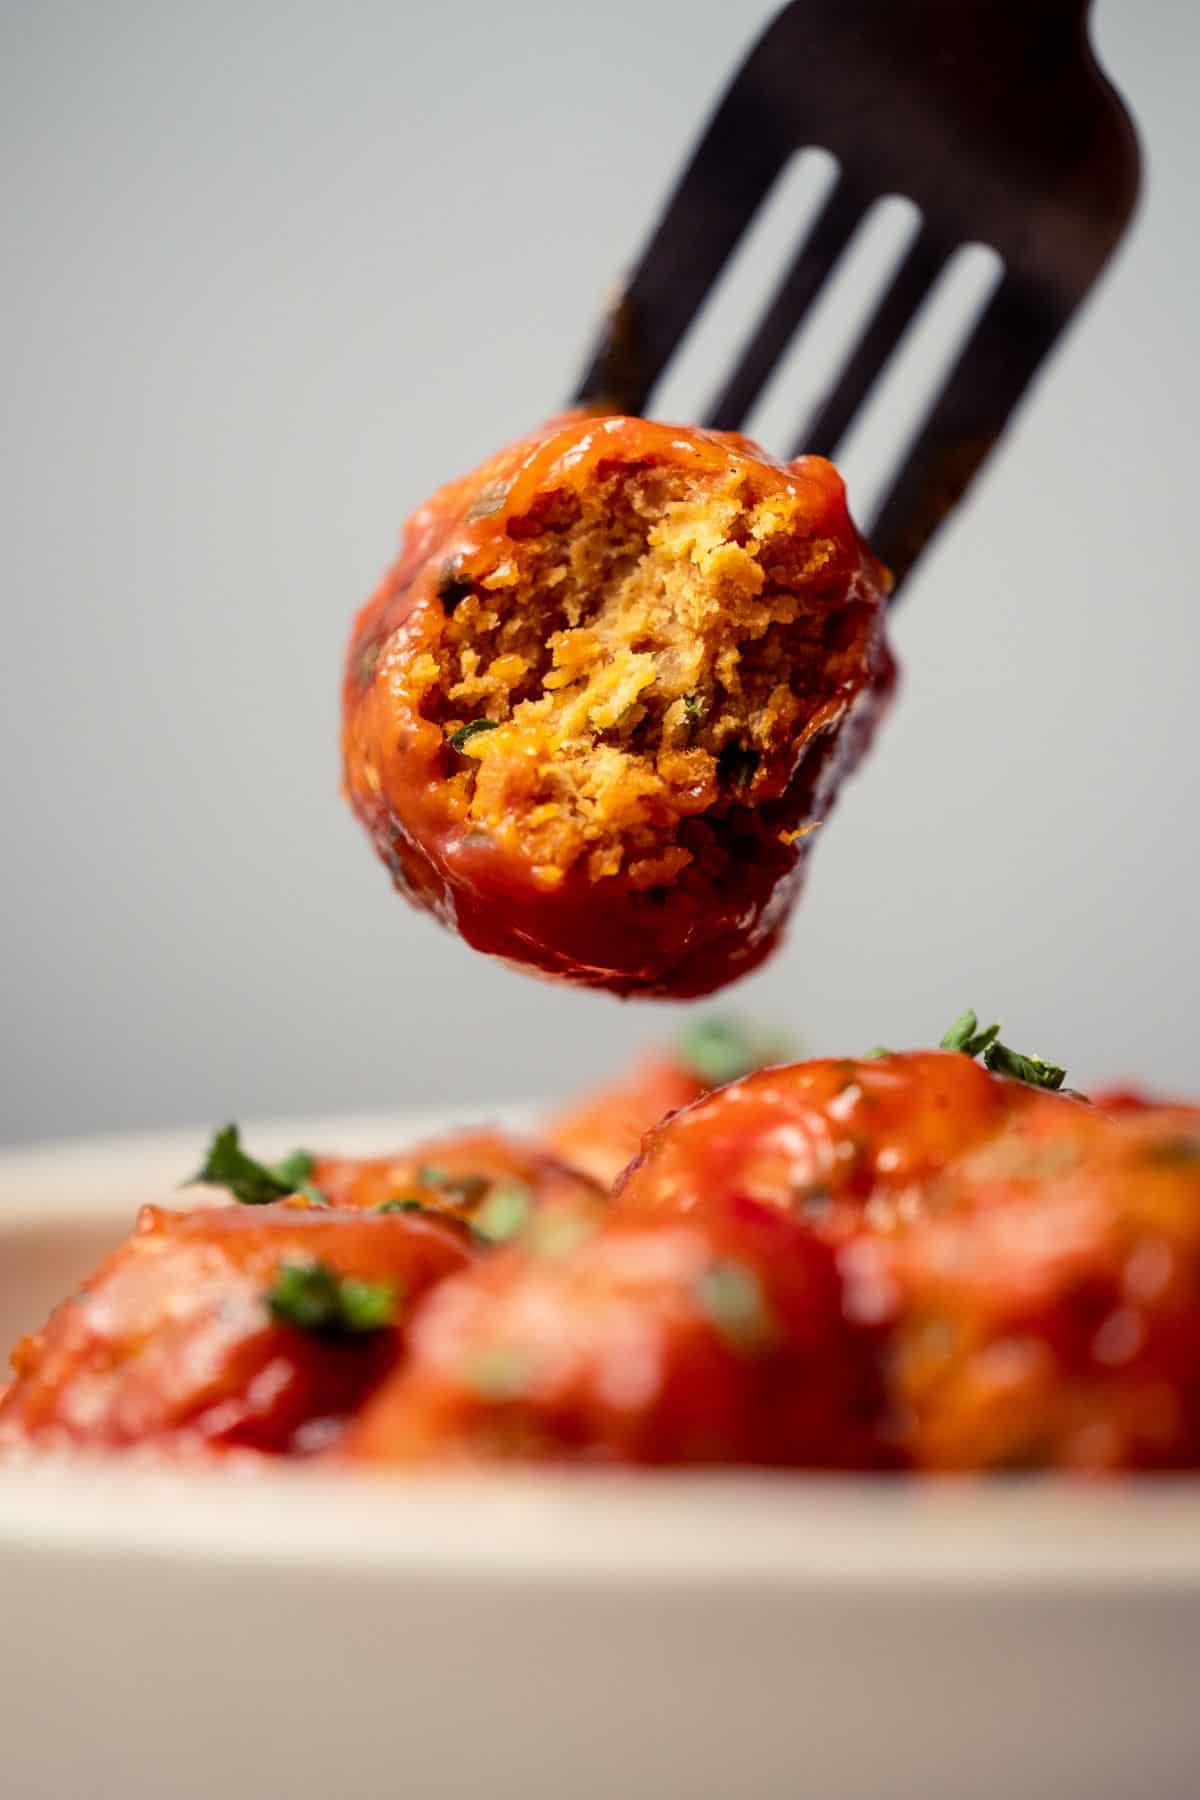 Chickpea meatball on a fork.